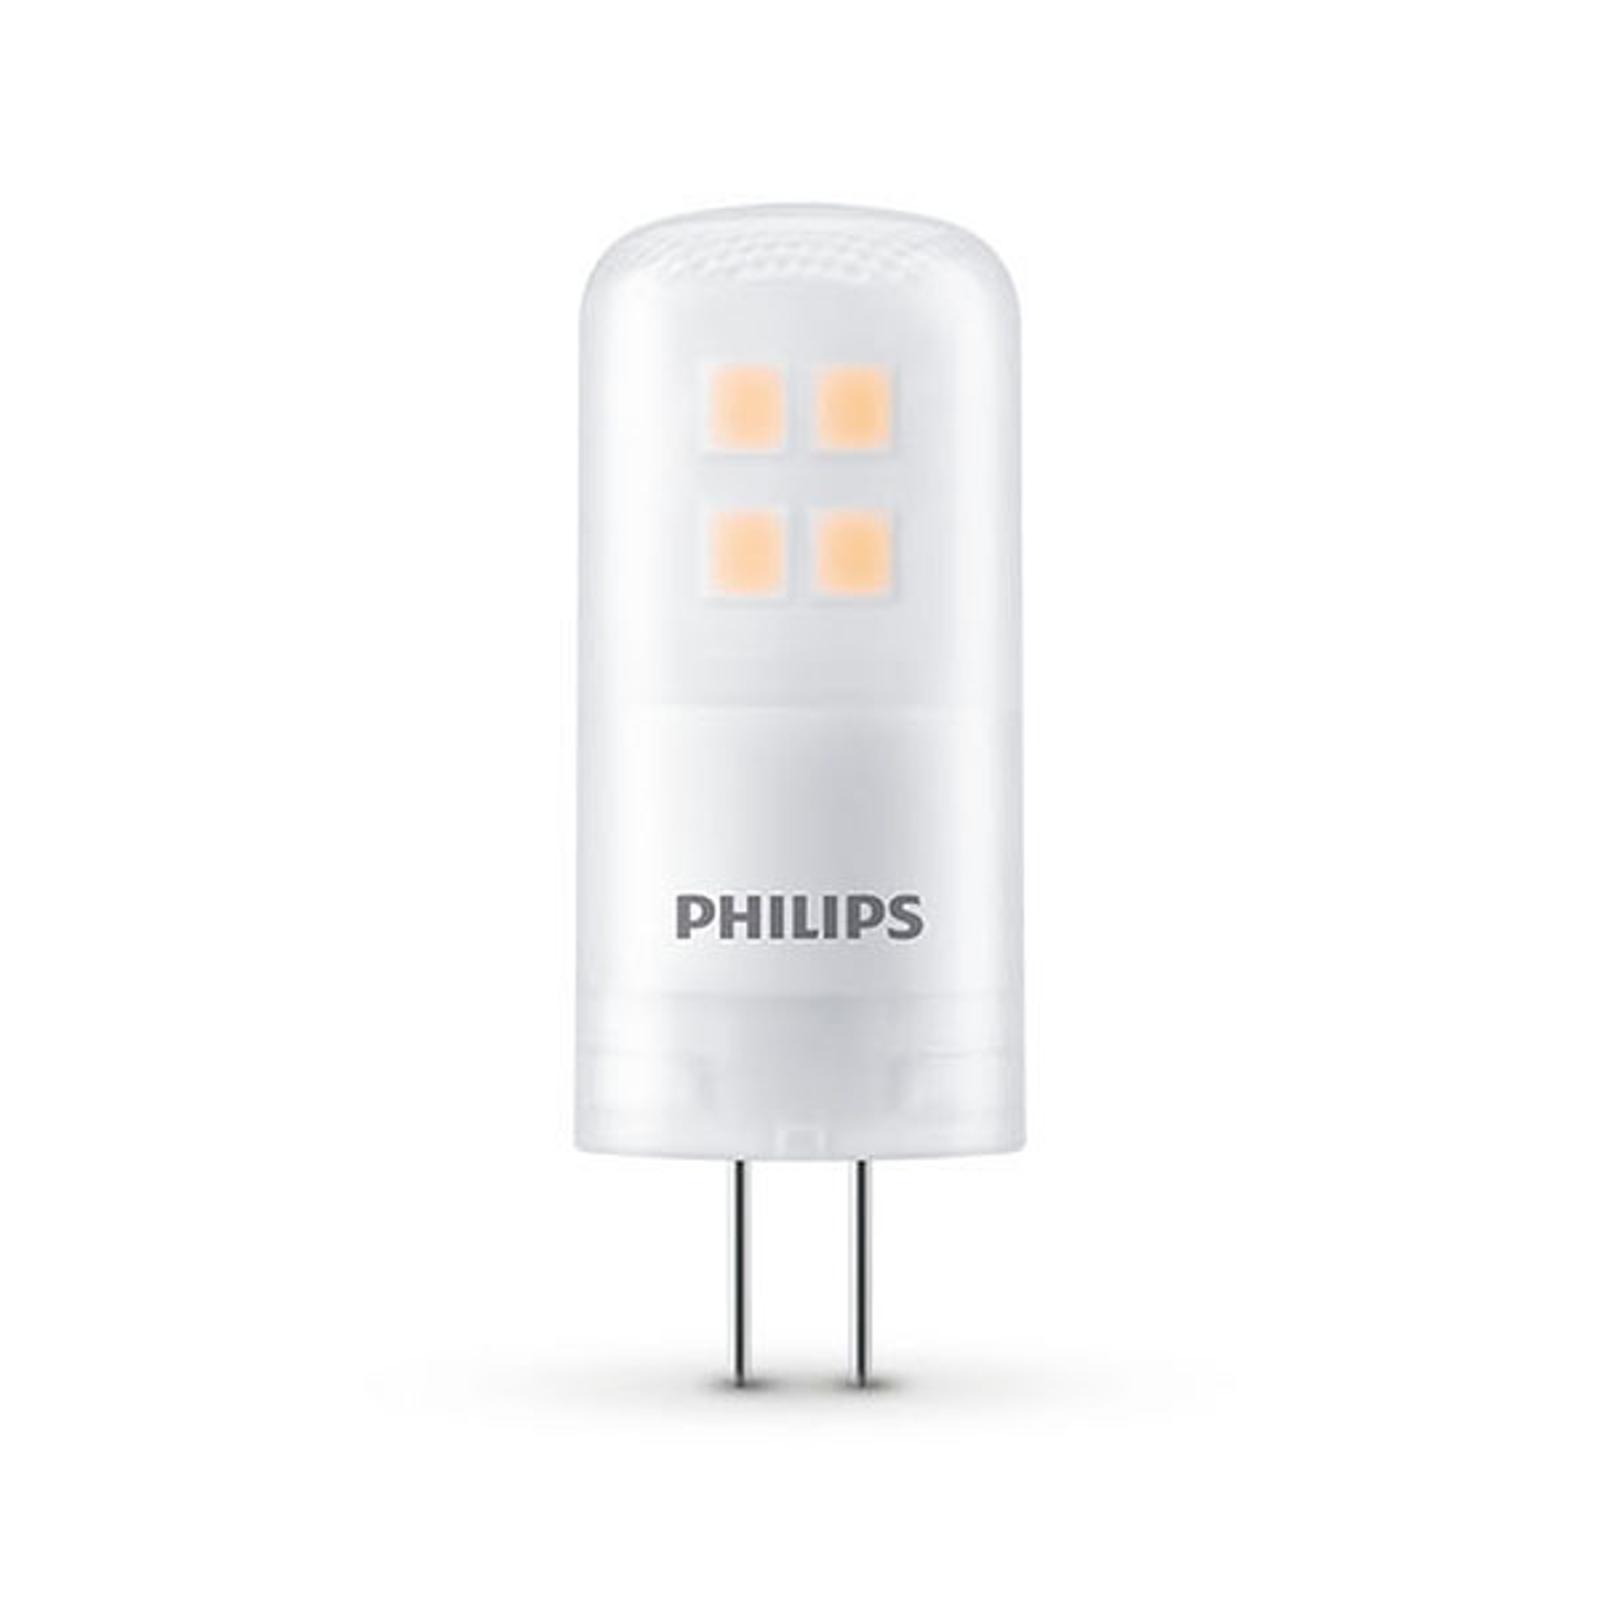 Philips LED-Stiftsockel G4 2,7W 2.700K matt